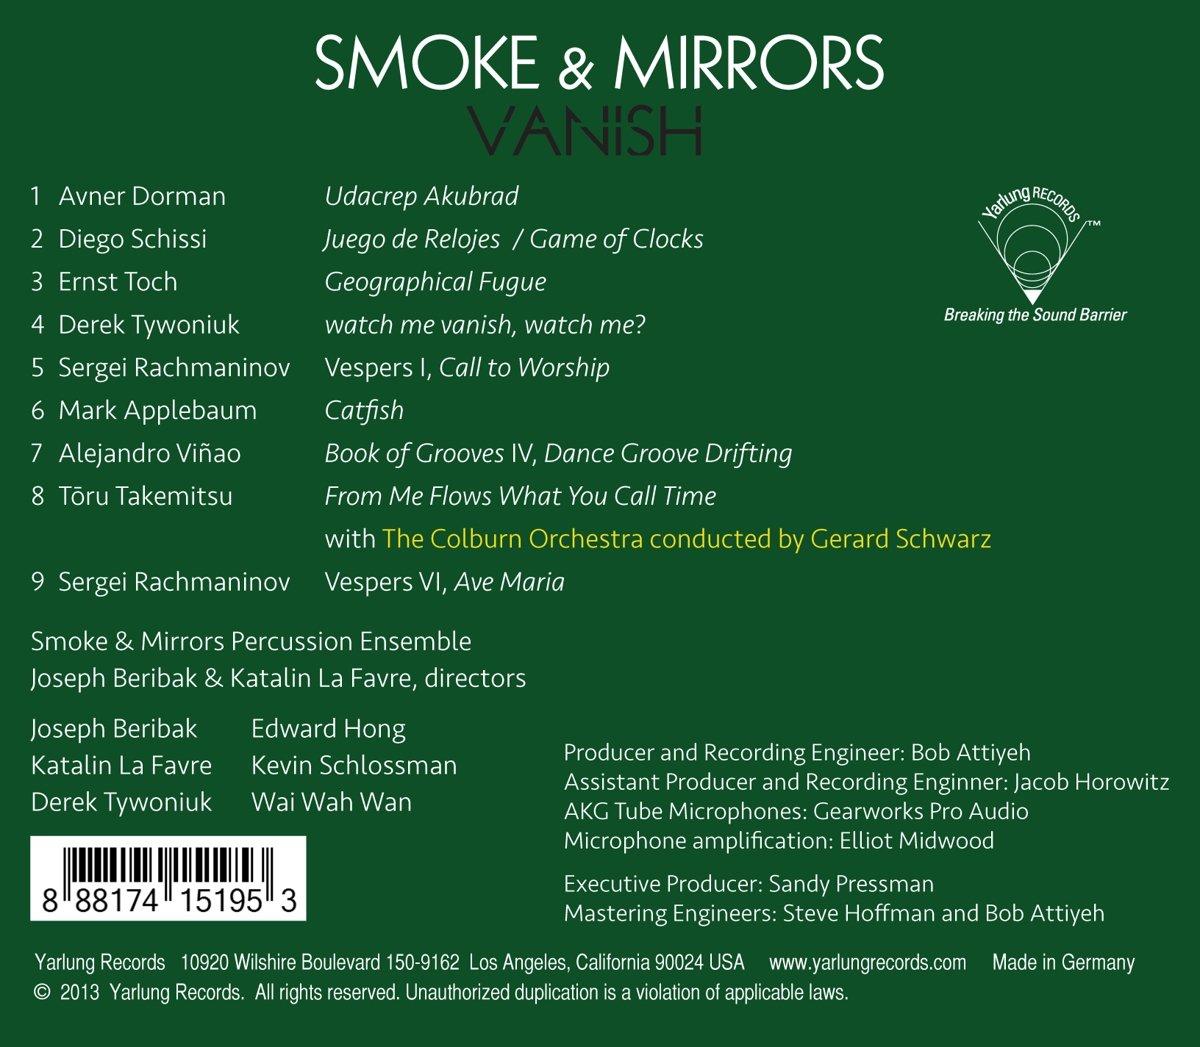 Smoke & Mirrors, Mark Applebaum, Sergei Rachmaninov, Alejandro Viñao, Derek Tywoniuk, Avner Dorman, Toru Takemitsu, Ernst Toch, Diego Schissi, ...